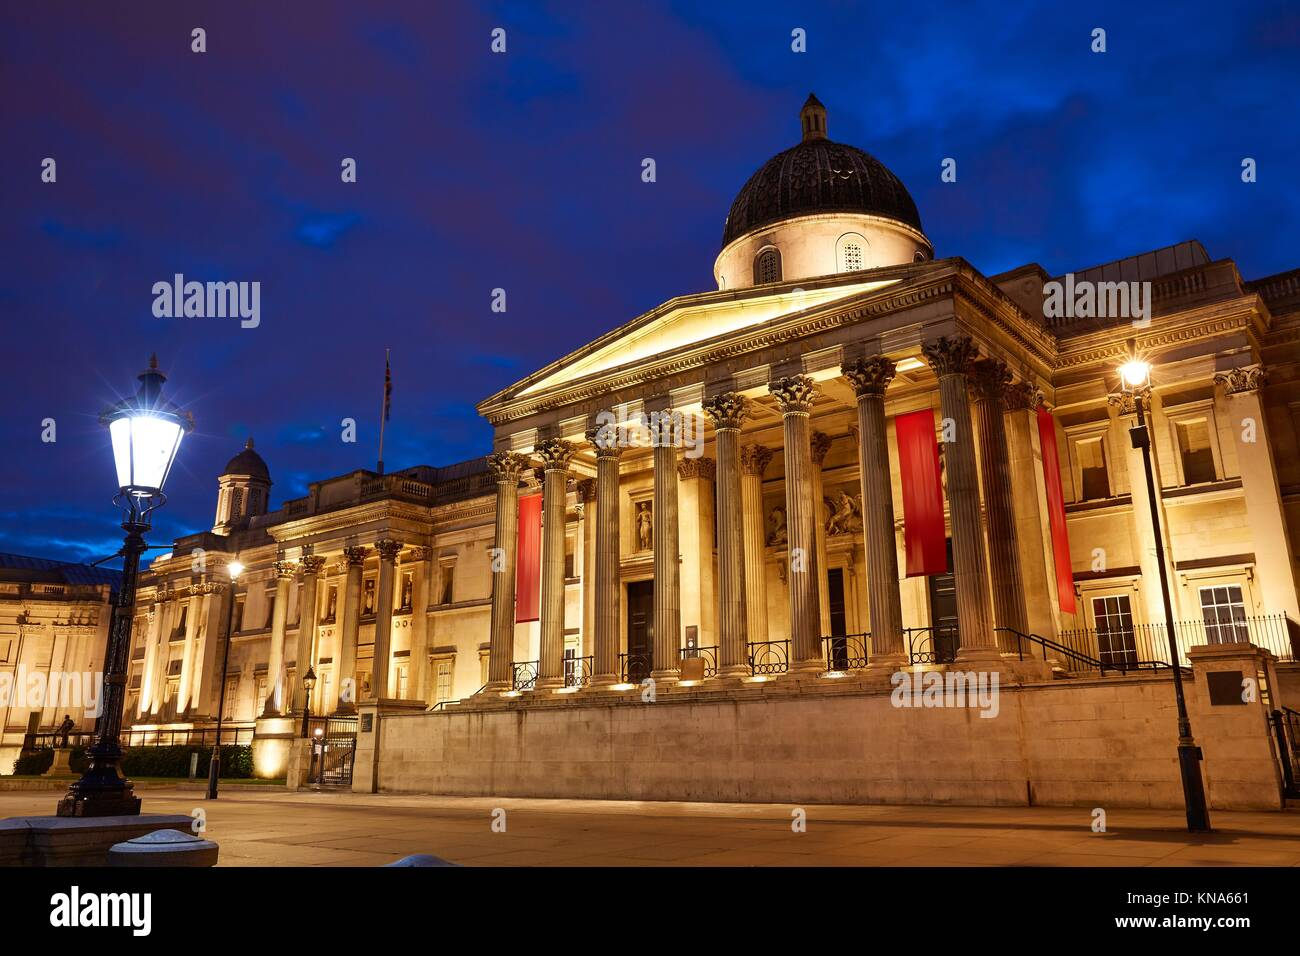 London National Galelery in Trafalgar Square at sunset England. - Stock Image